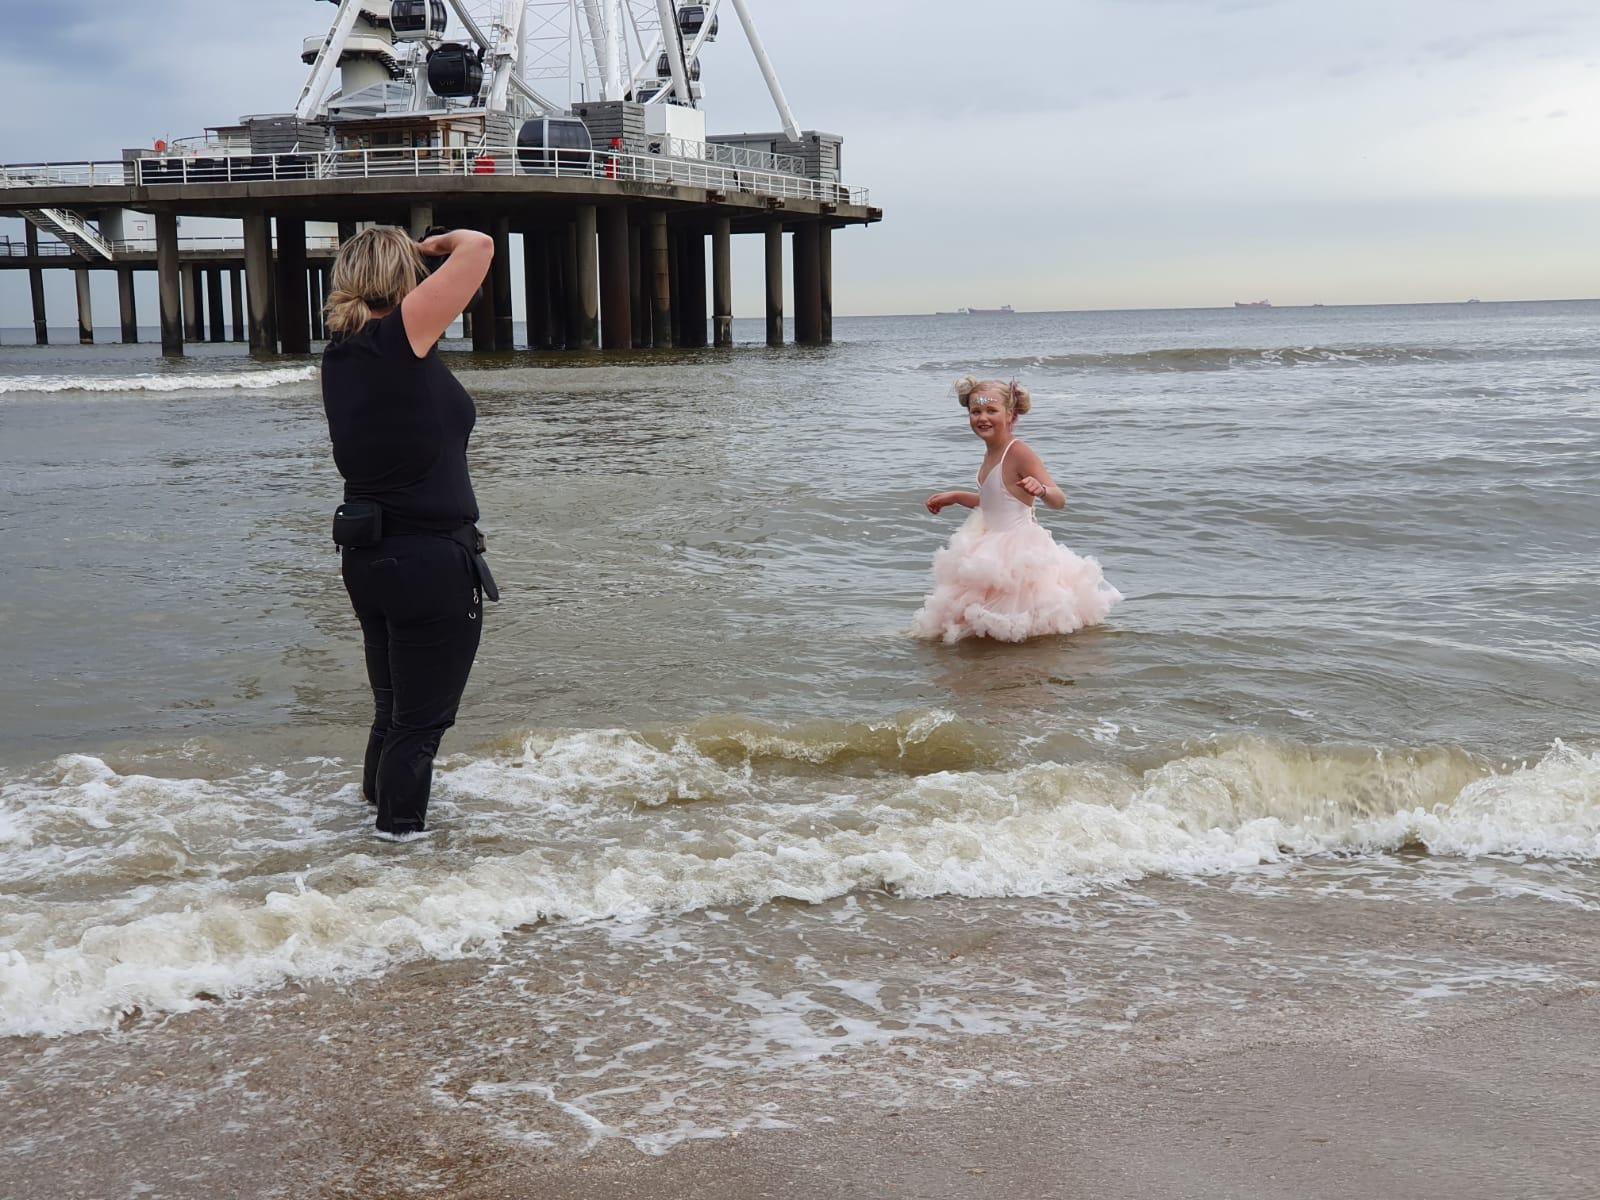 boudoir fotograaf Nederland zwolle training workshop fotograaf sensueel empowerment scheveningen pier strand beach